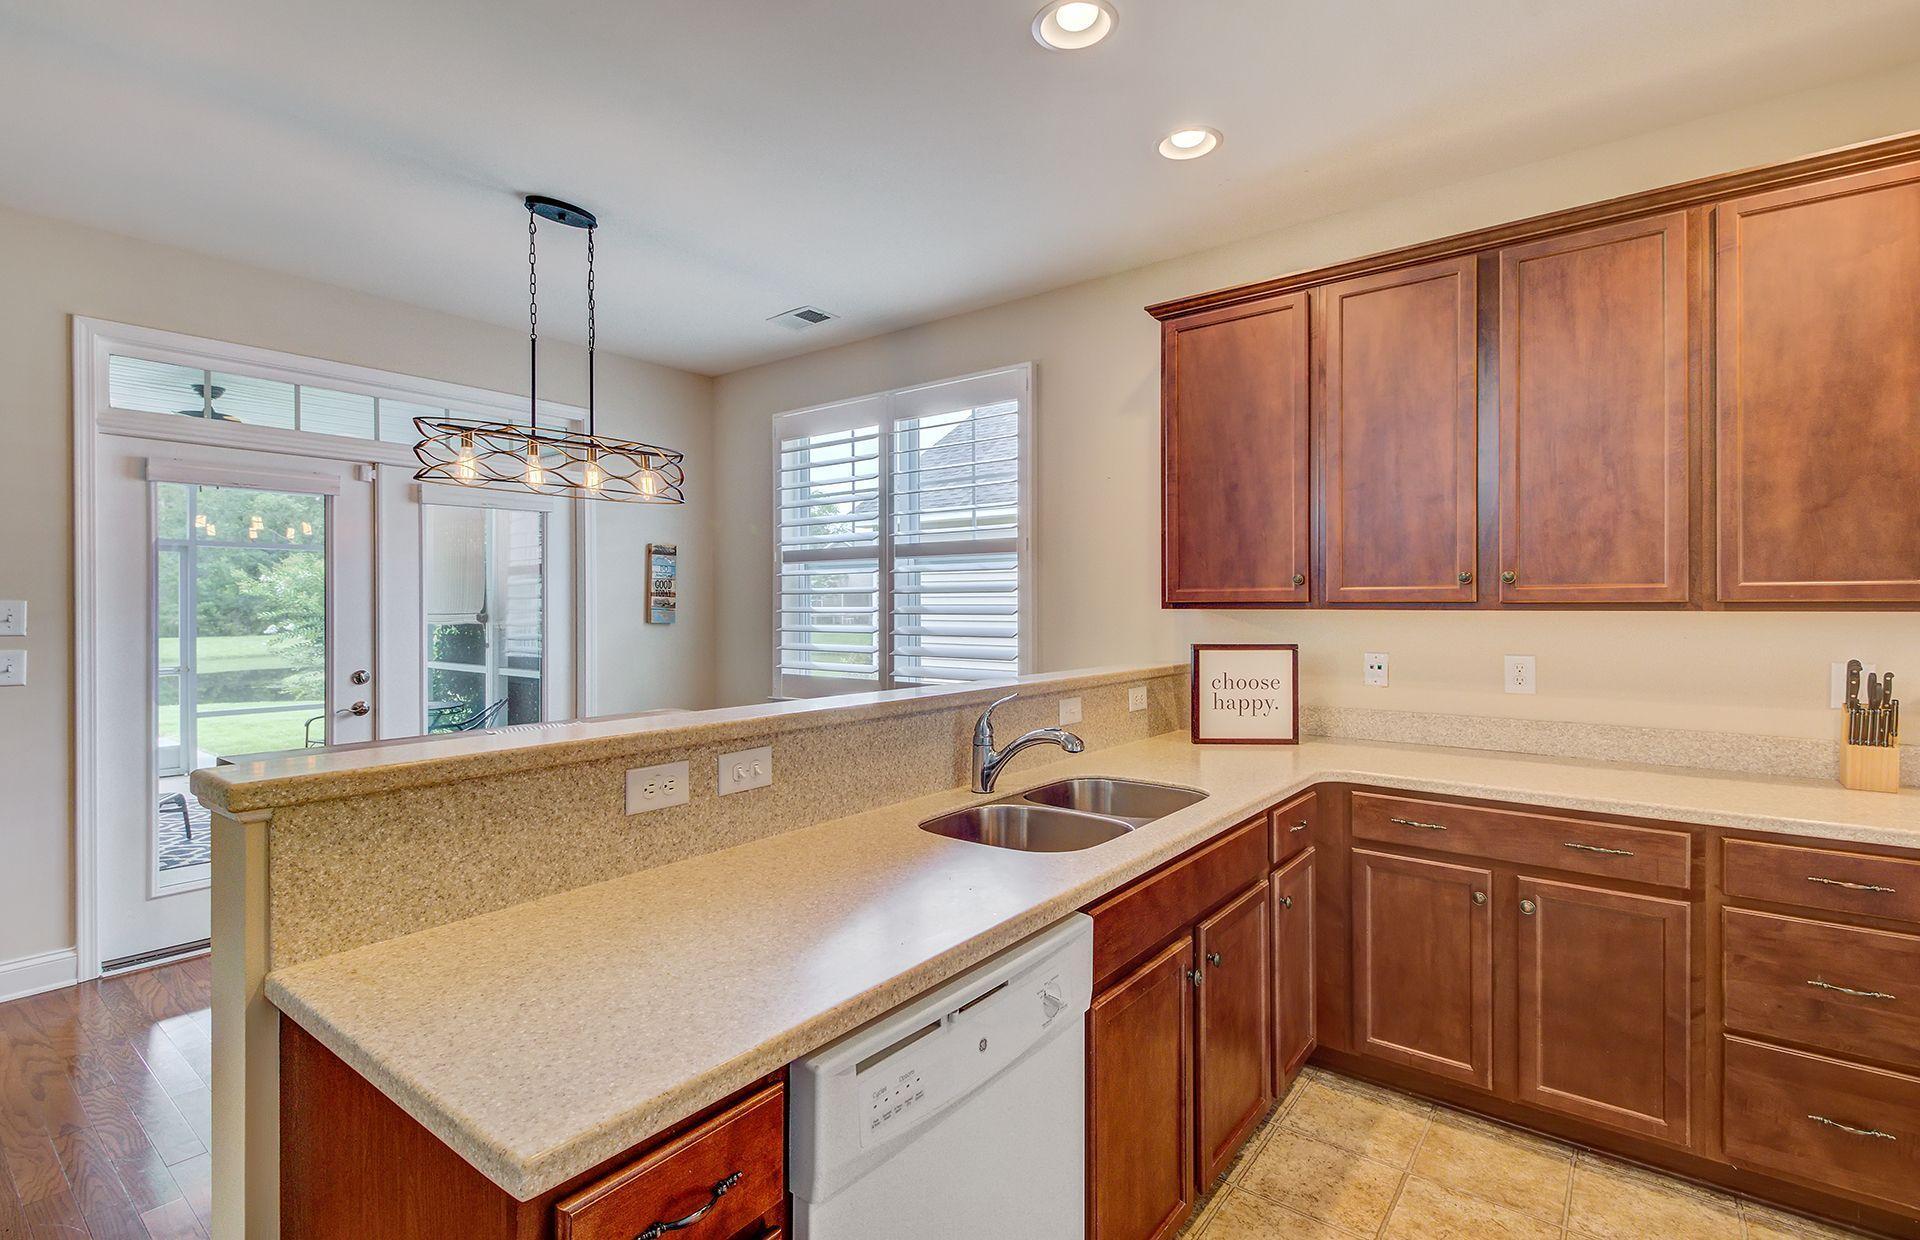 Linnen Place Homes For Sale - 1275 Shingleback, Mount Pleasant, SC - 1